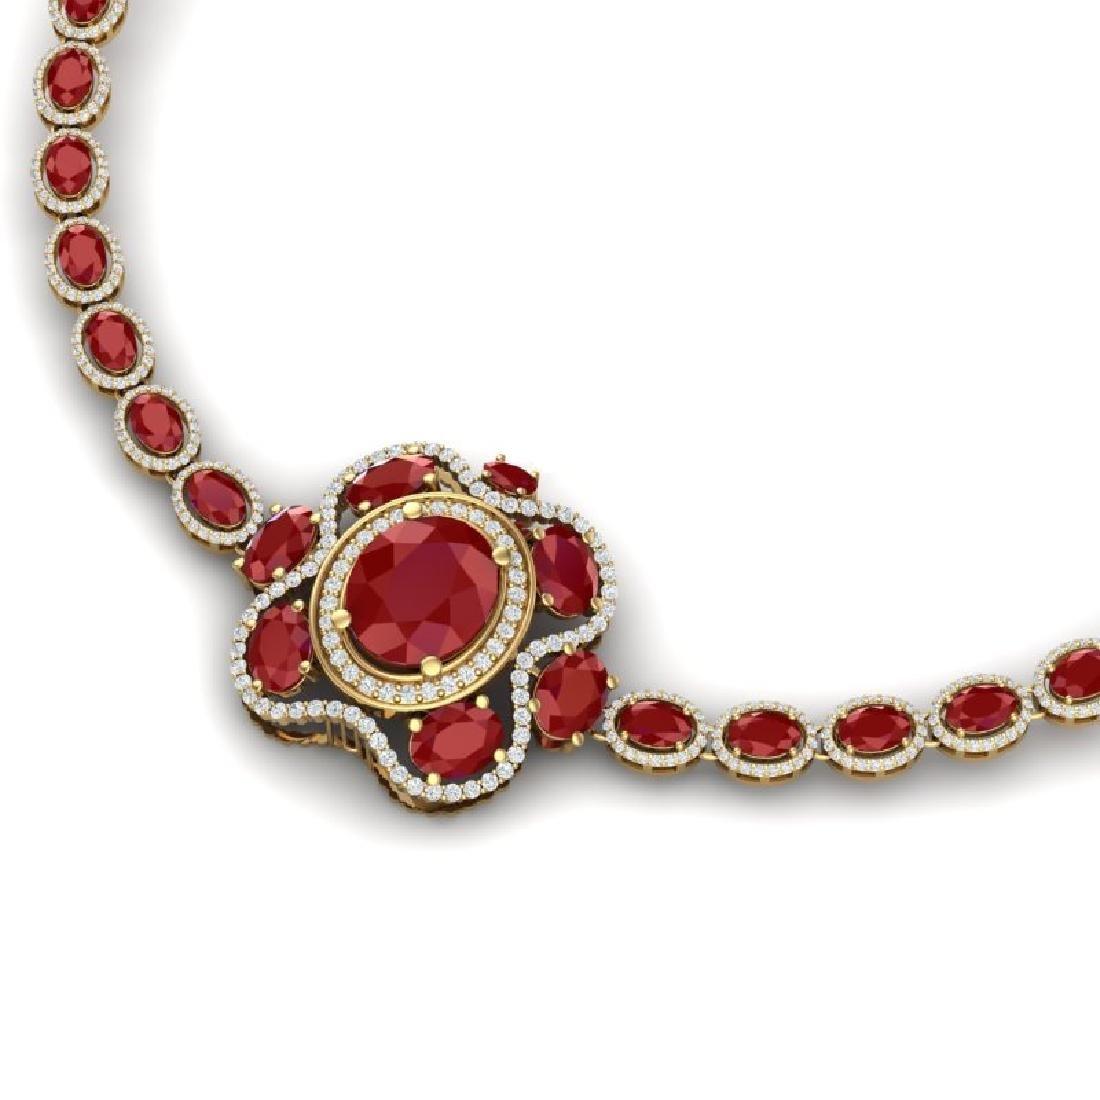 47.43 CTW Royalty Ruby & VS Diamond Necklace 18K Yellow